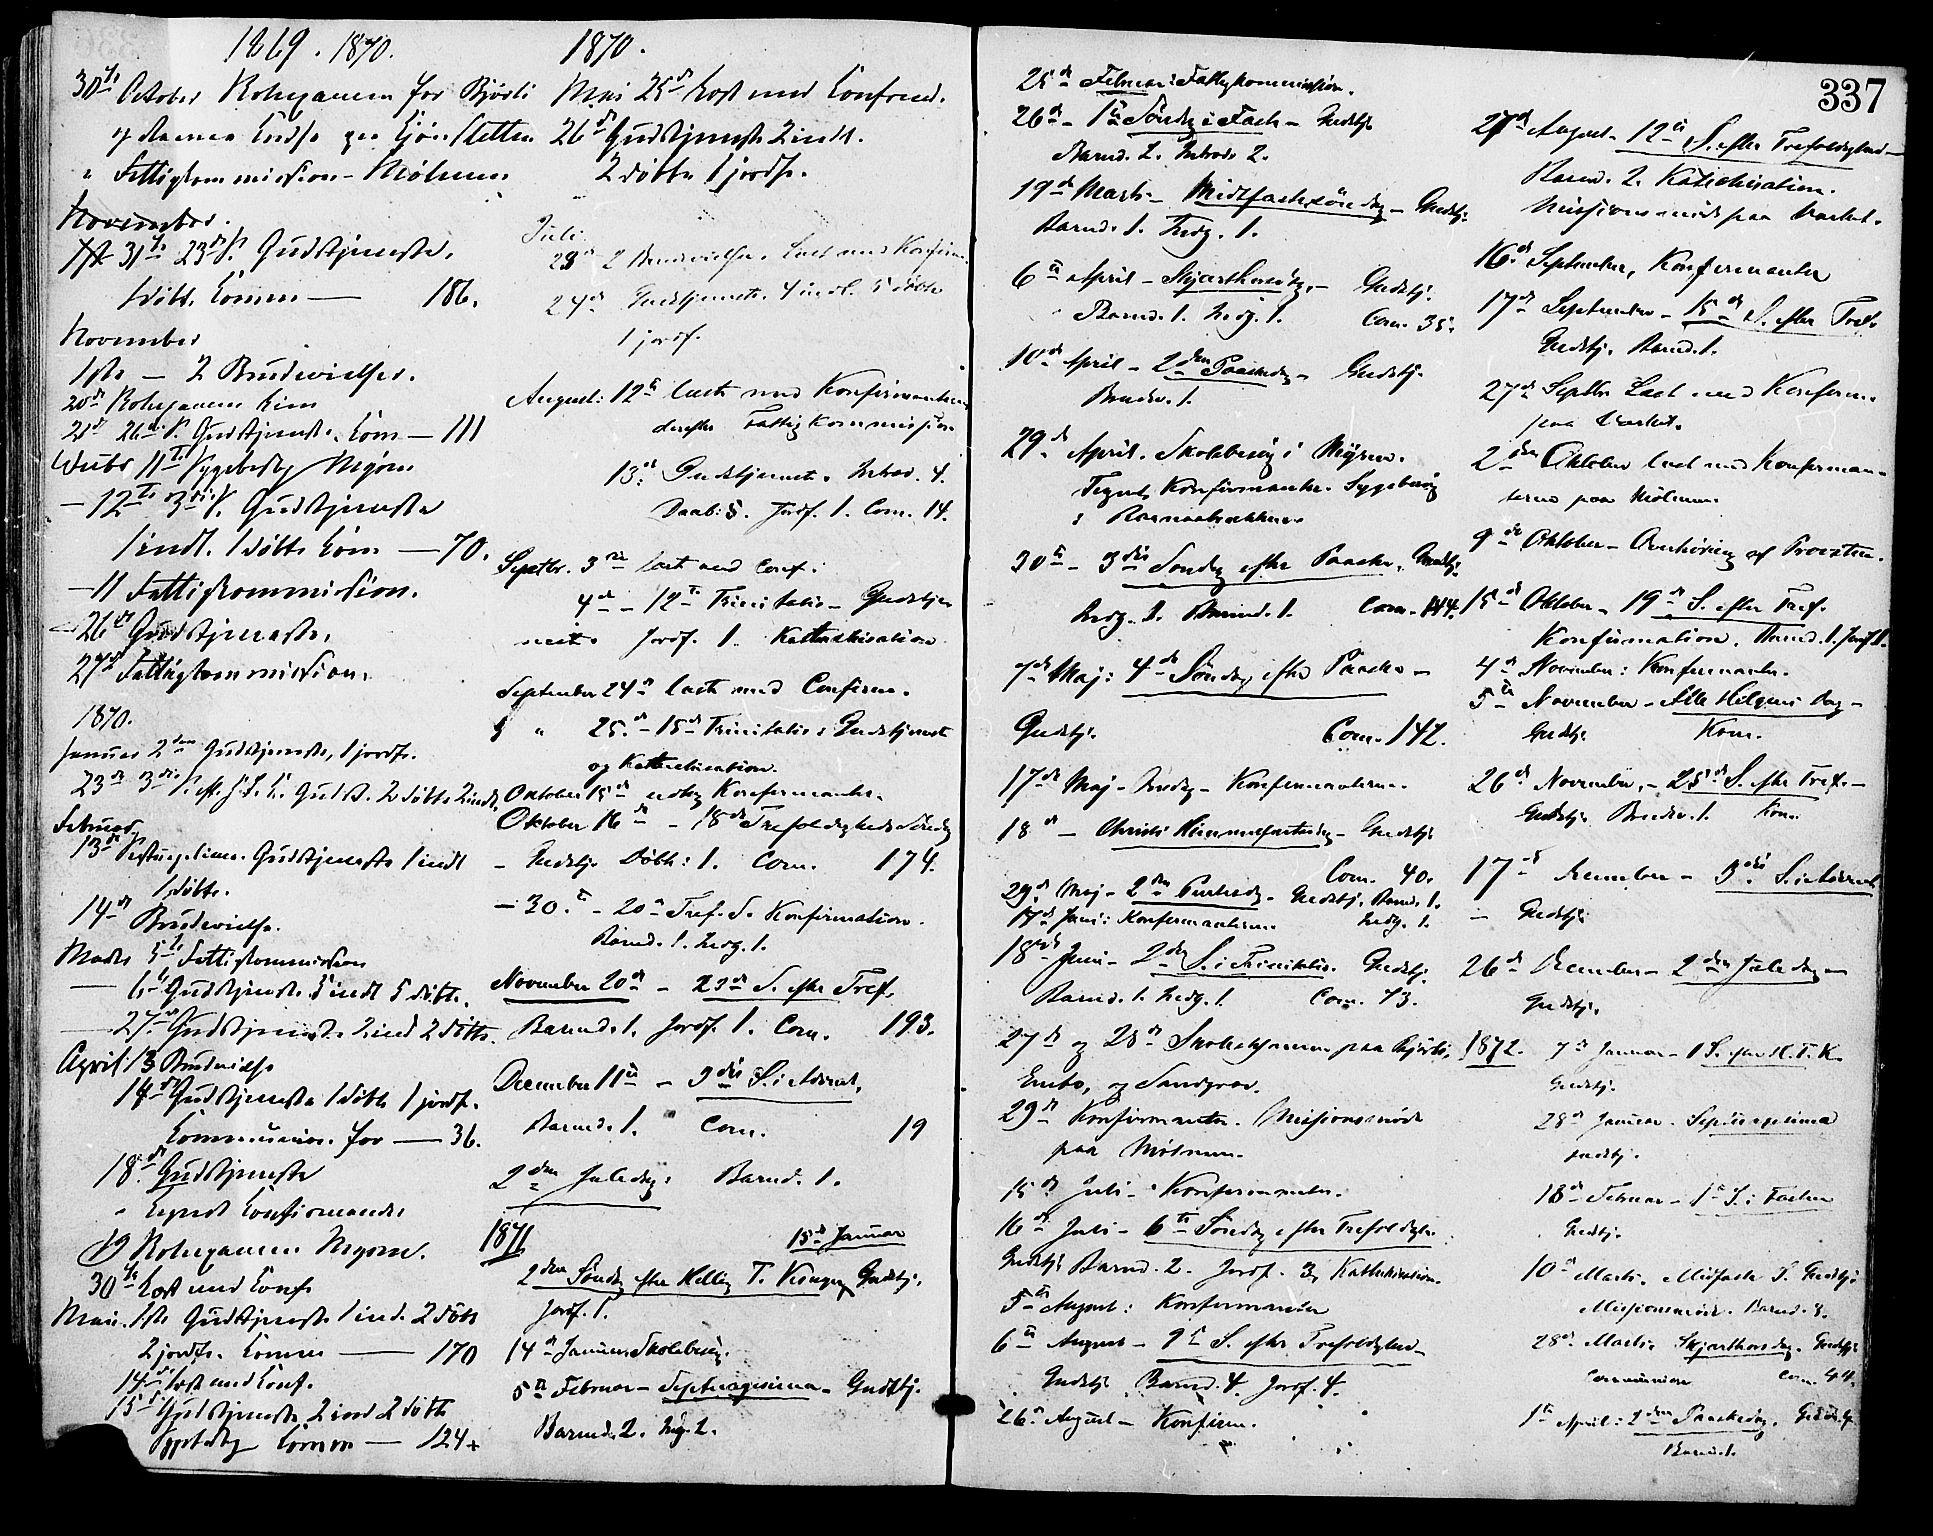 SAH, Lesja prestekontor, Ministerialbok nr. 9, 1854-1889, s. 337